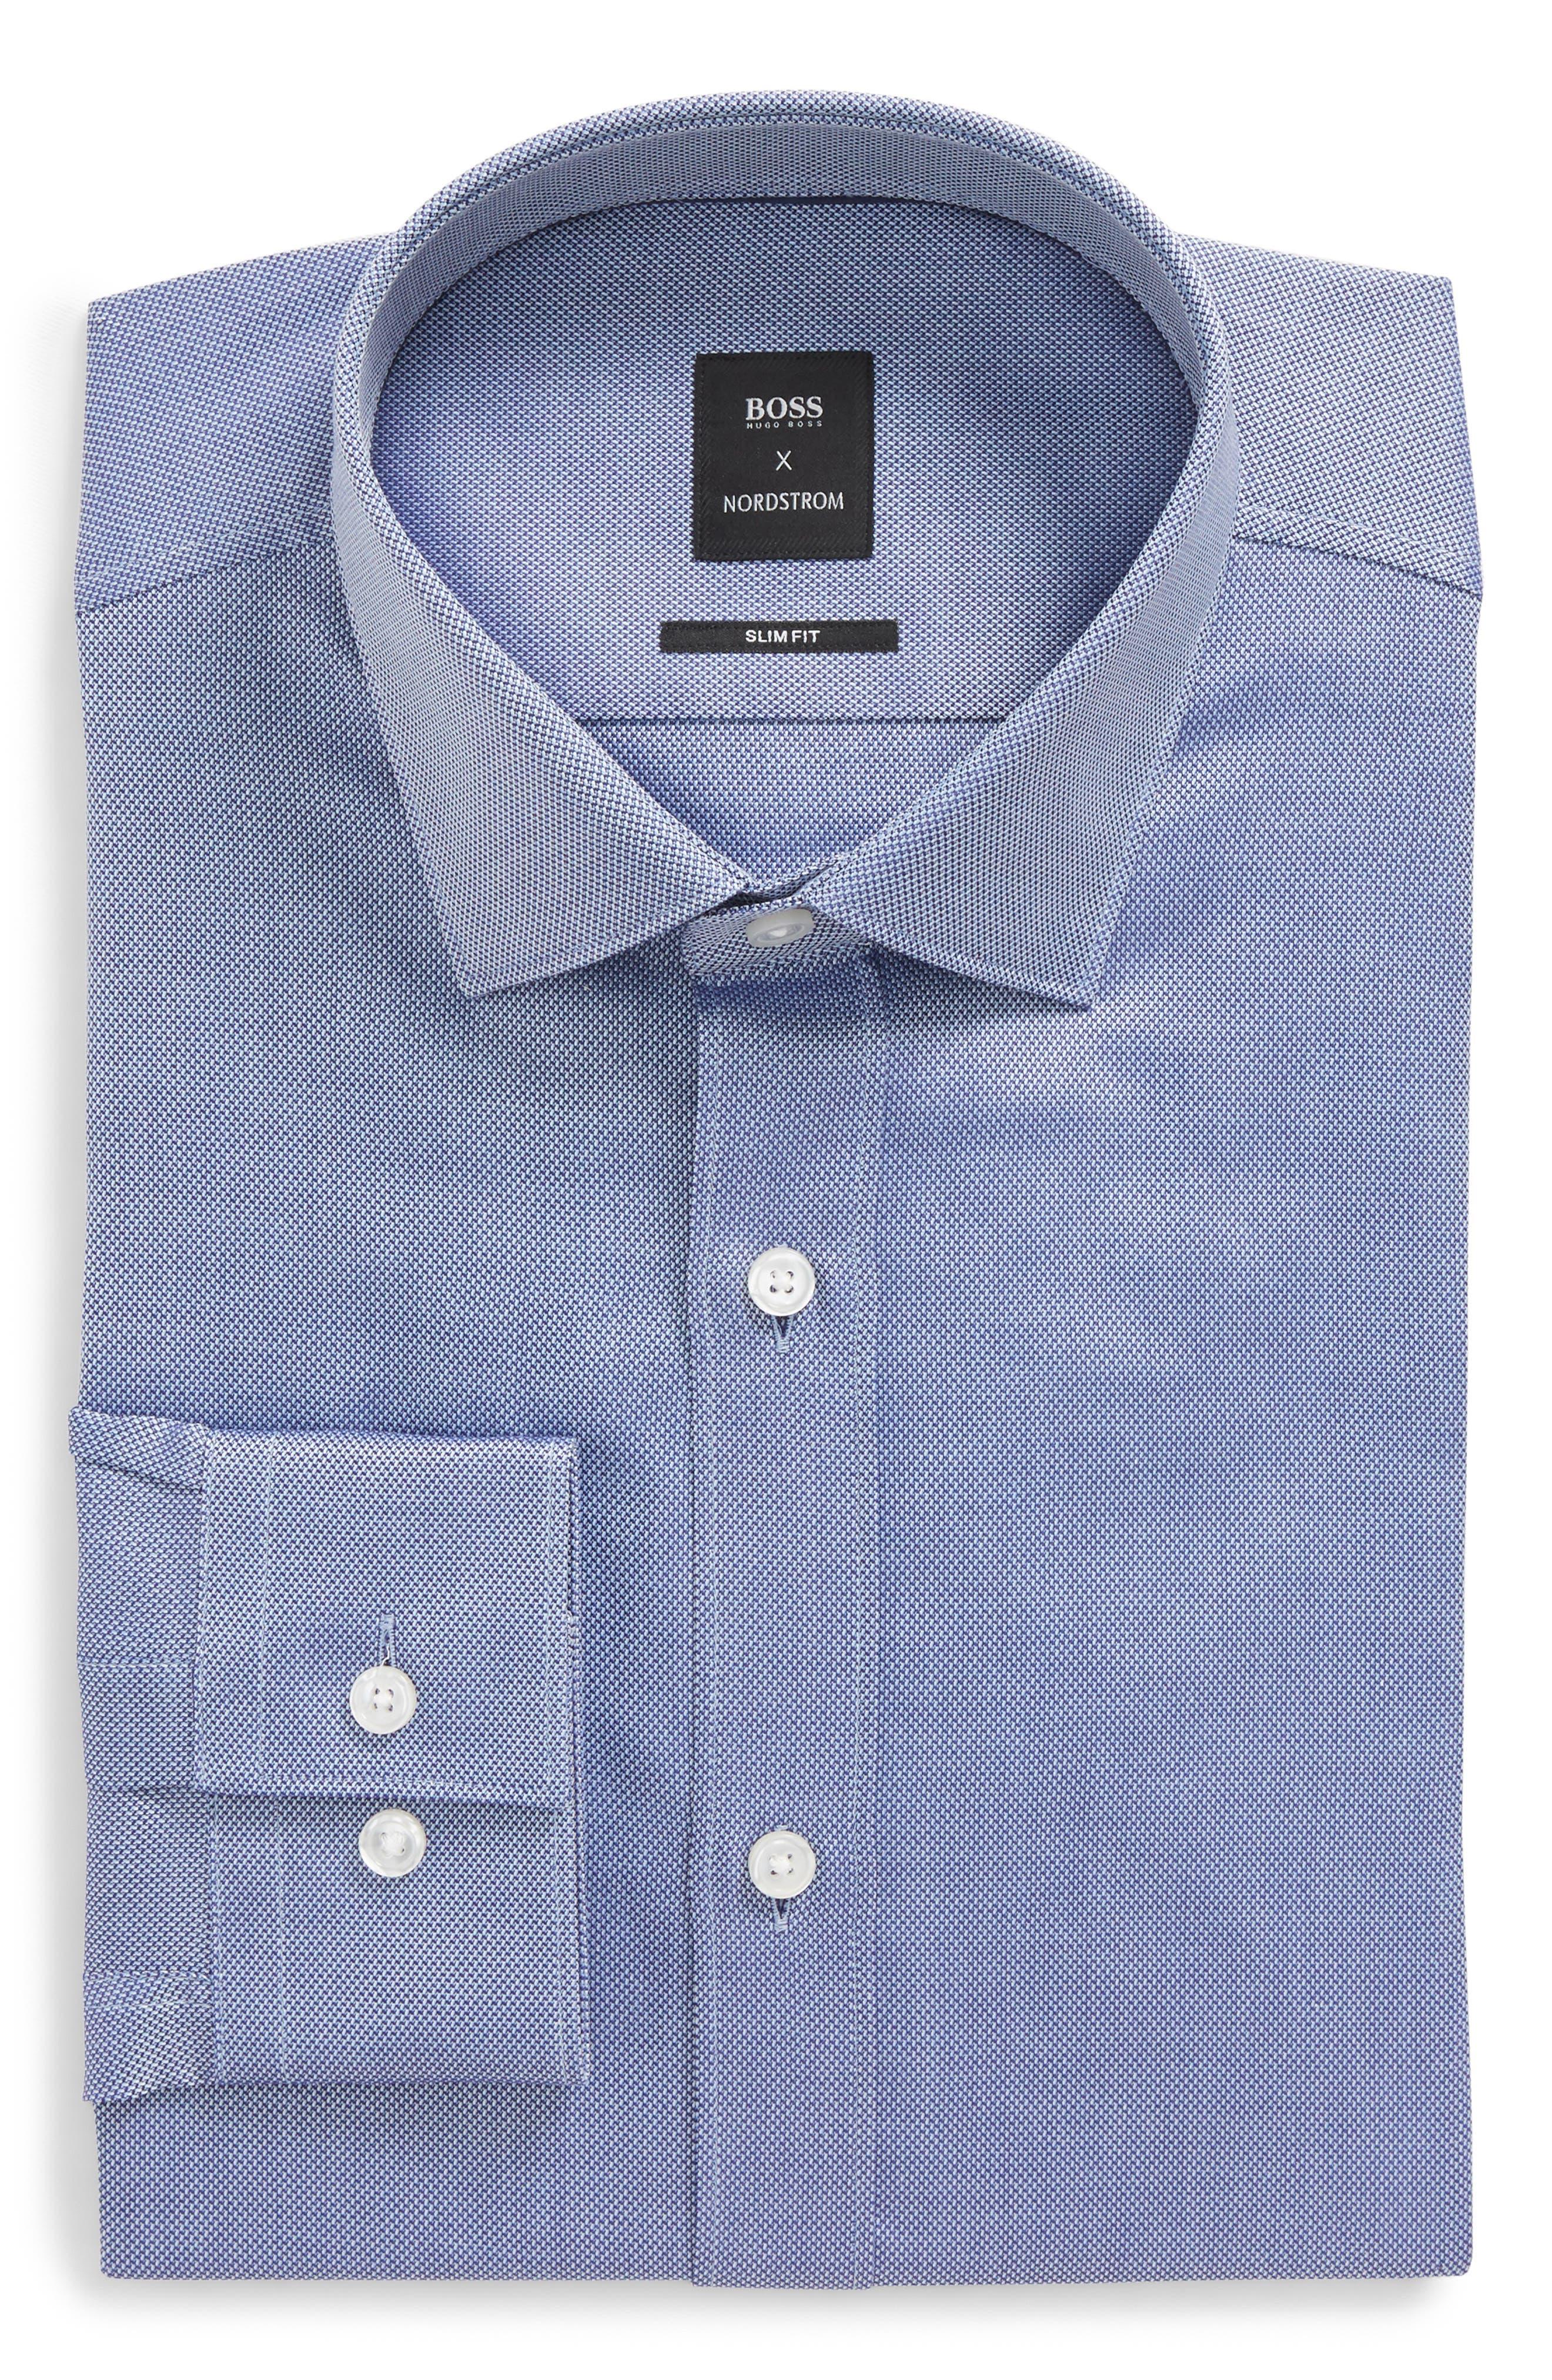 Nordstrom x BOSS Isaak Slim Fit Solid Dress Shirt,                             Main thumbnail 1, color,                             420